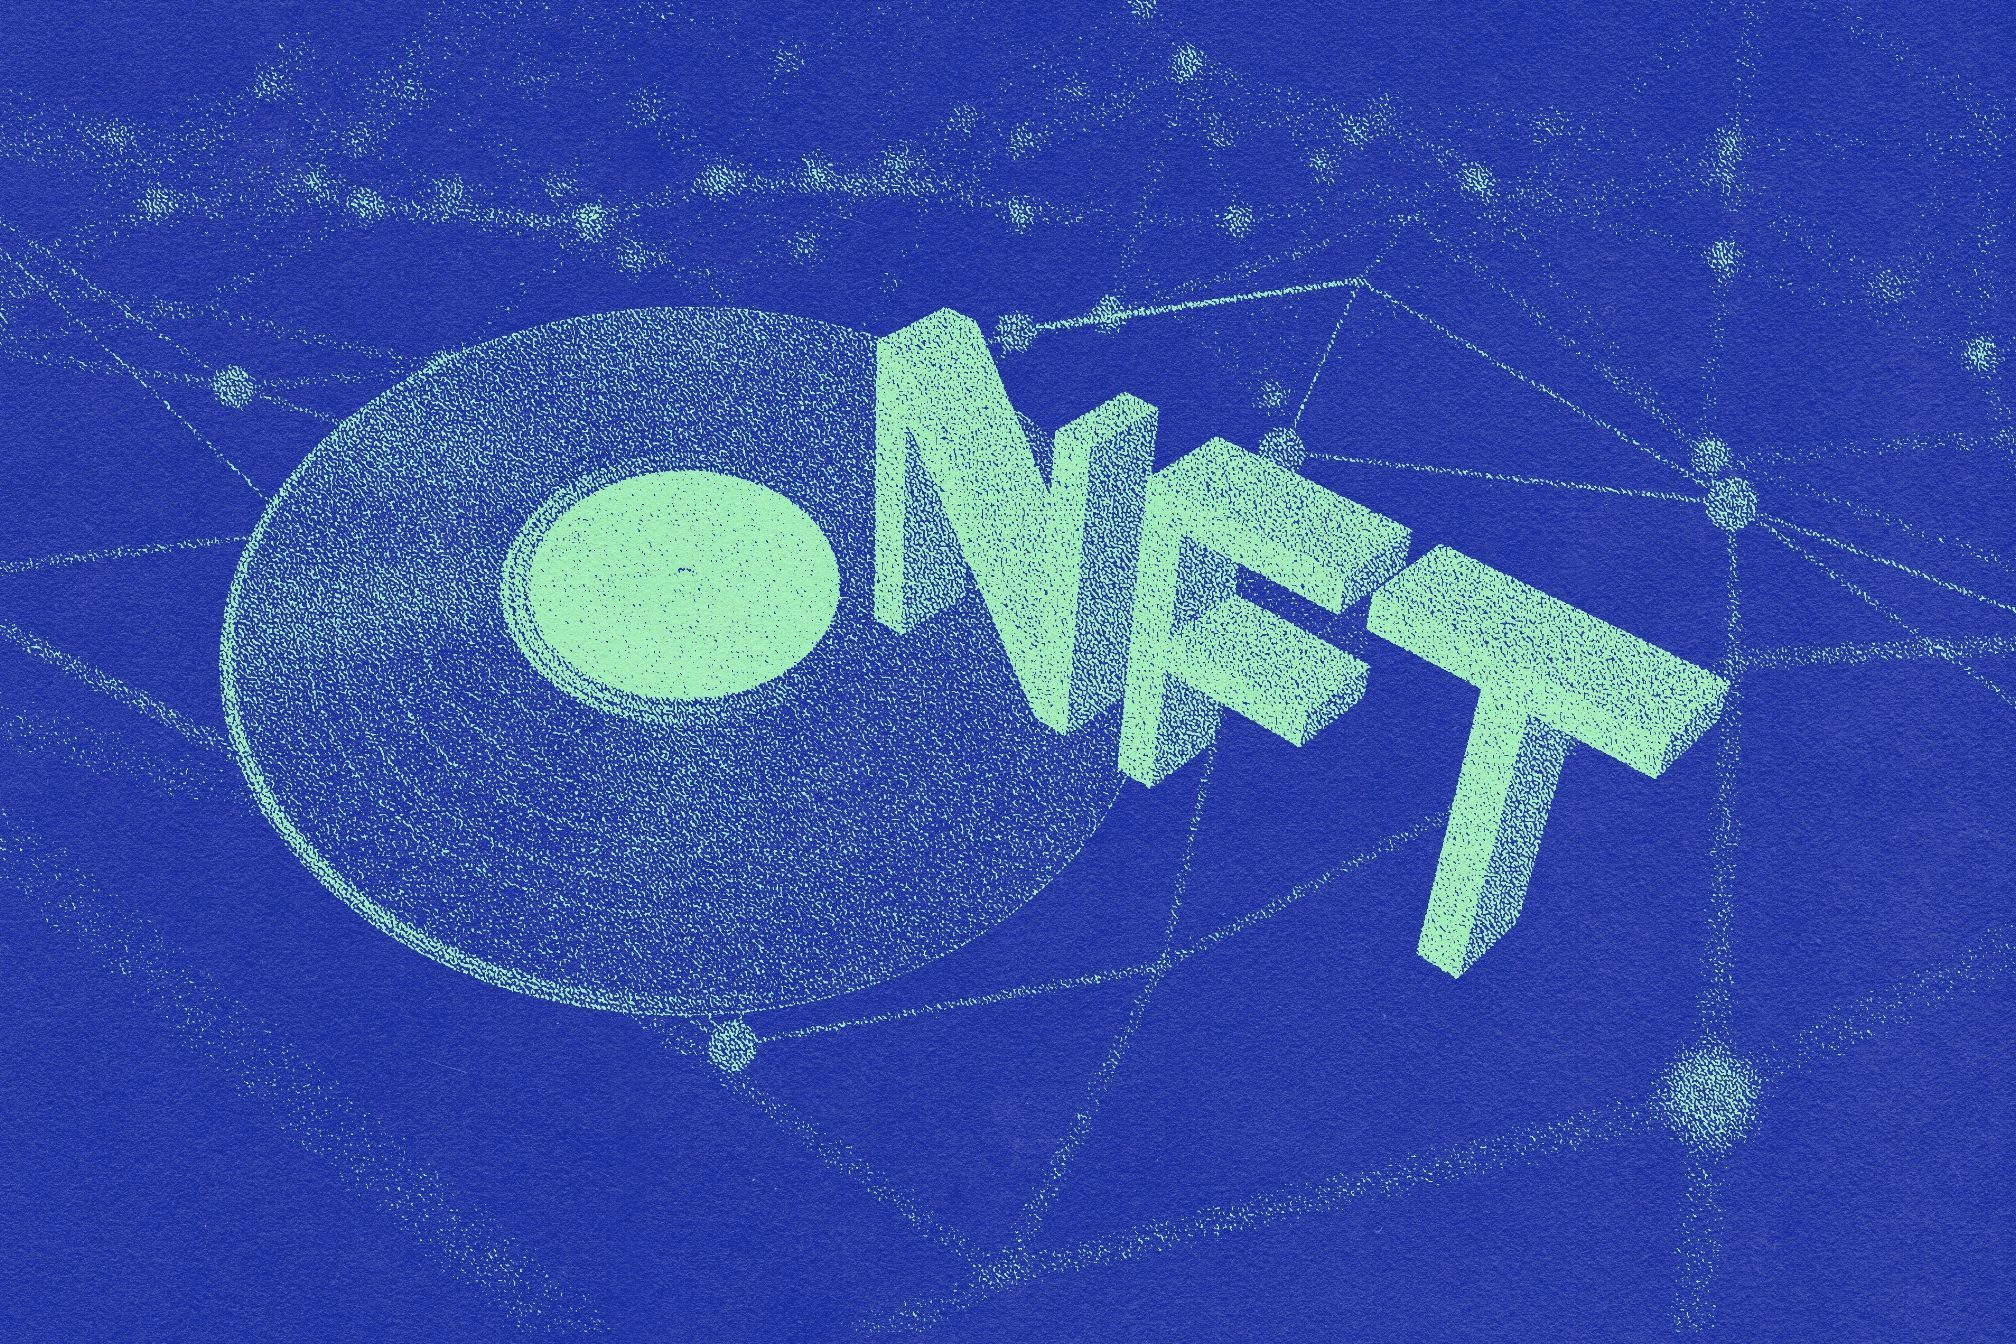 NFT marketplace token SuperRare rises 900% after launch